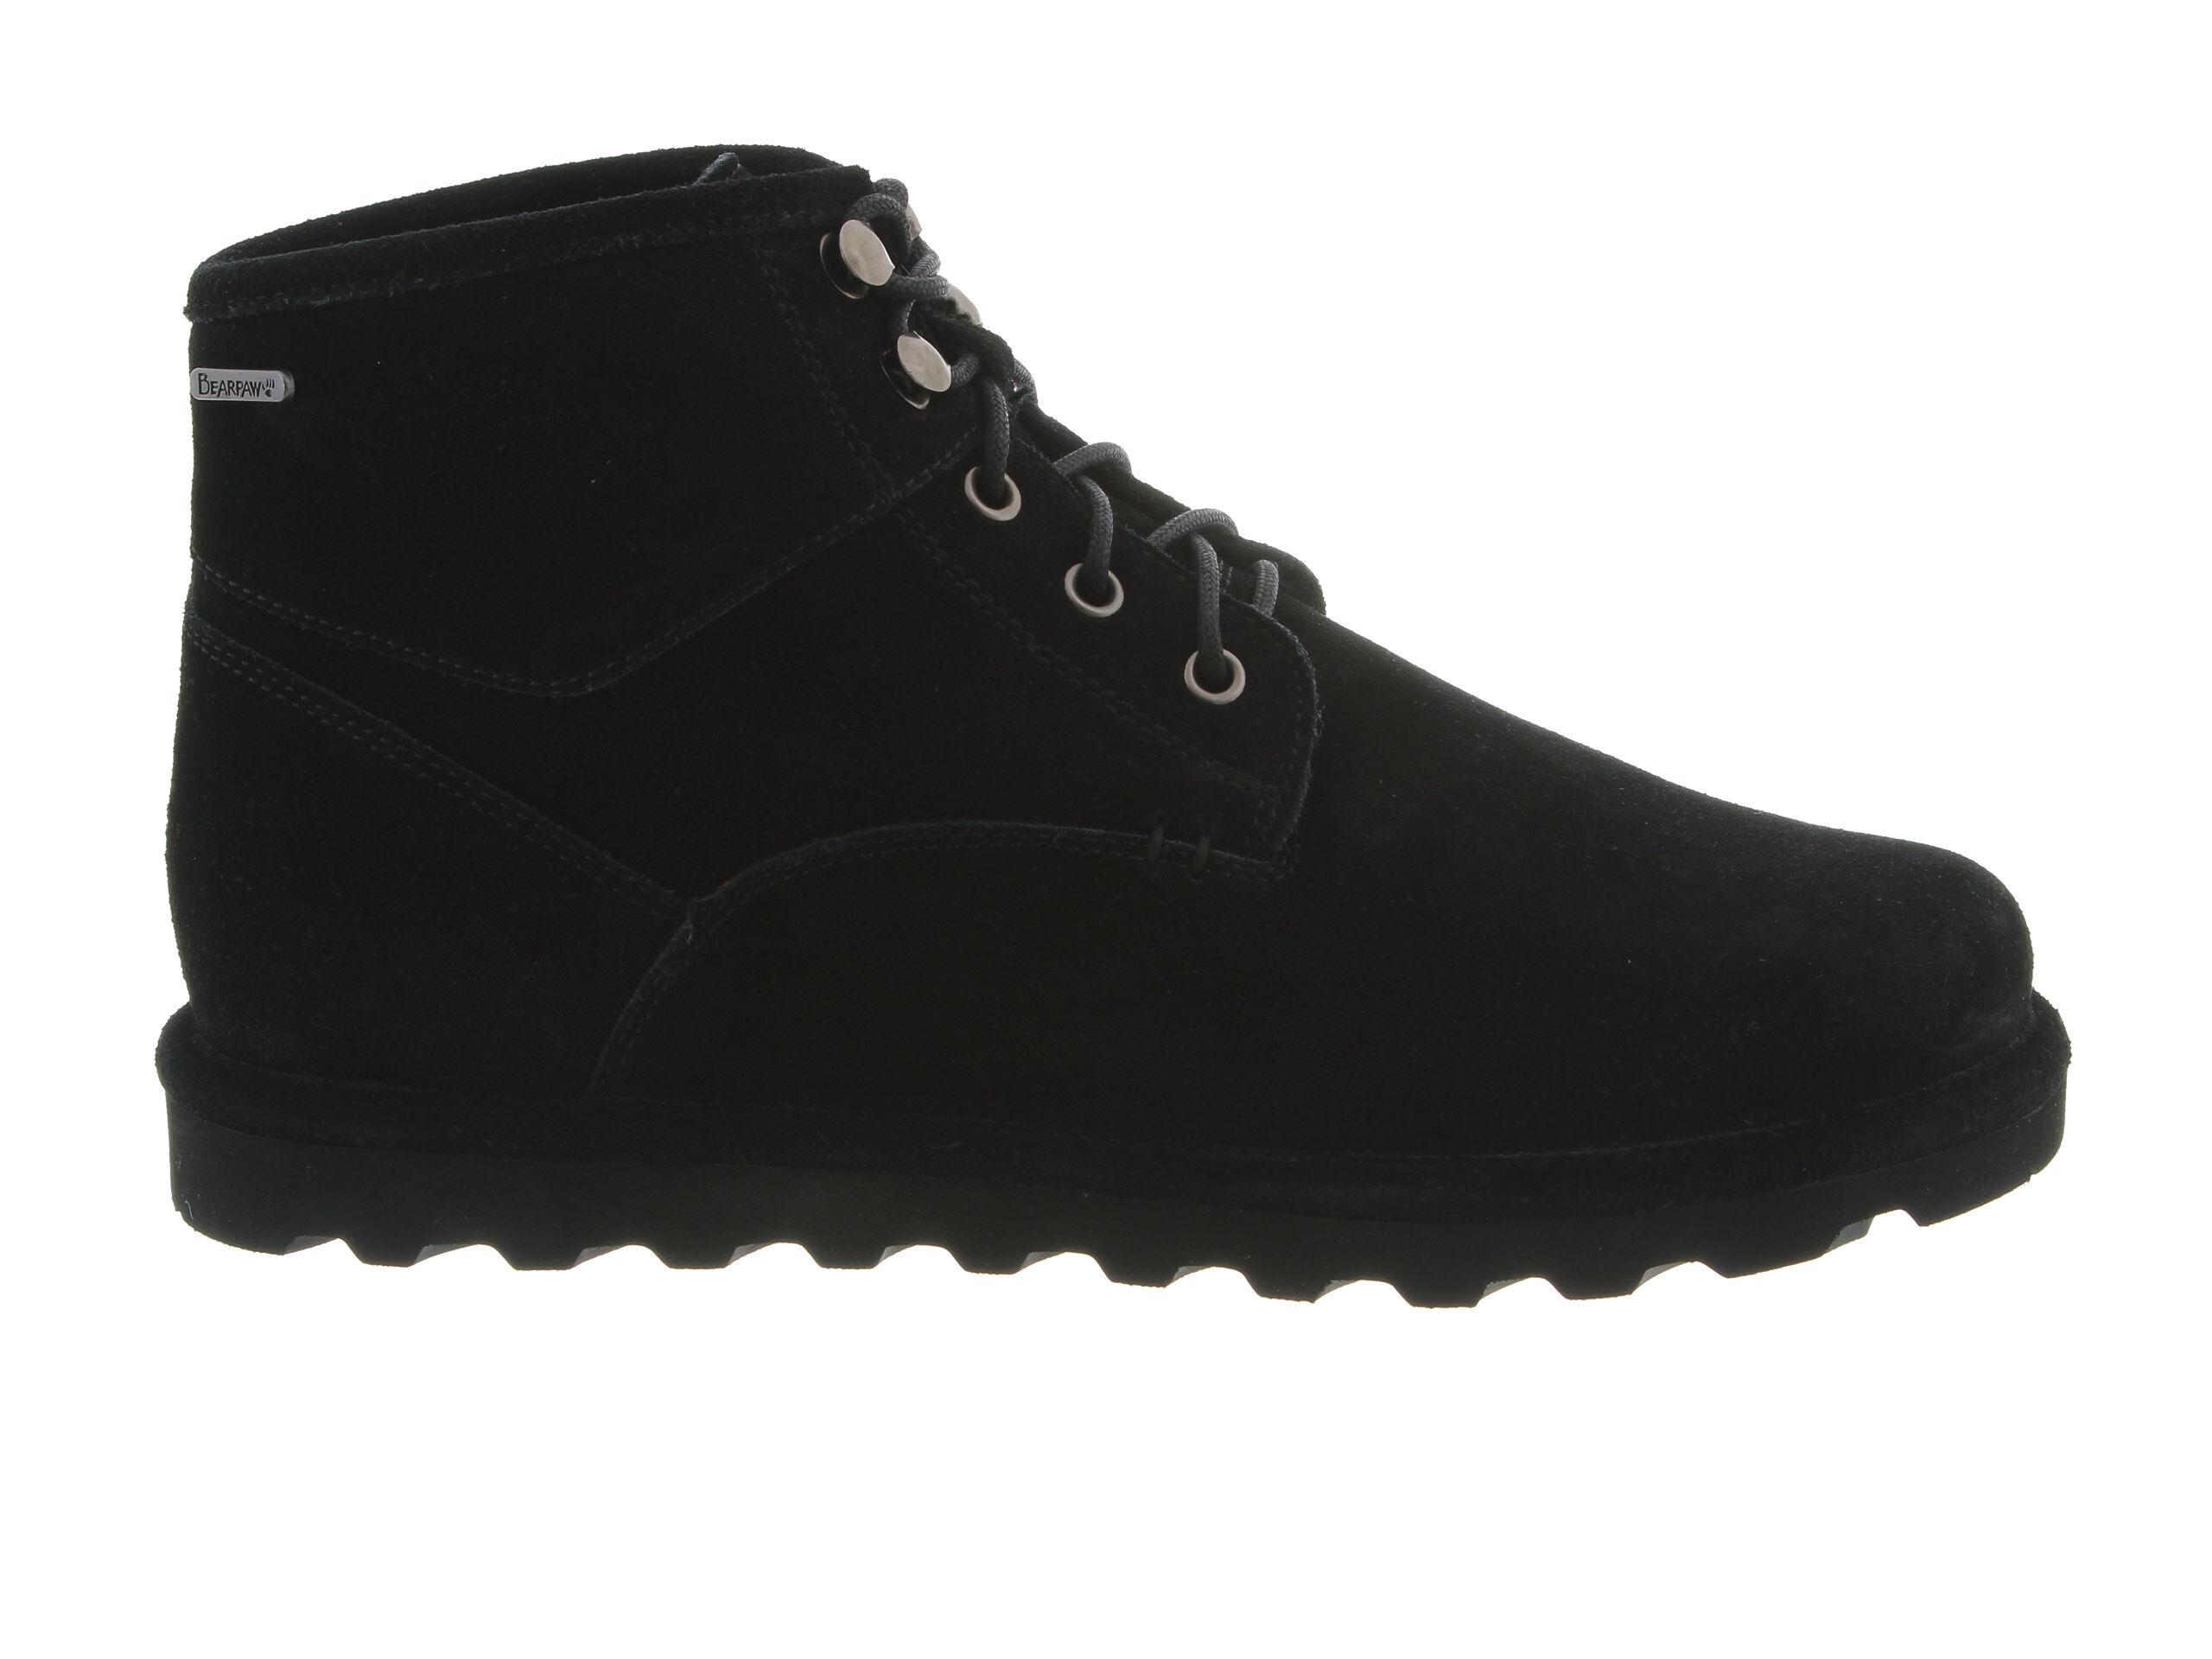 Classic Fit Men's Bearpaw Rueben Chukka Boots Black